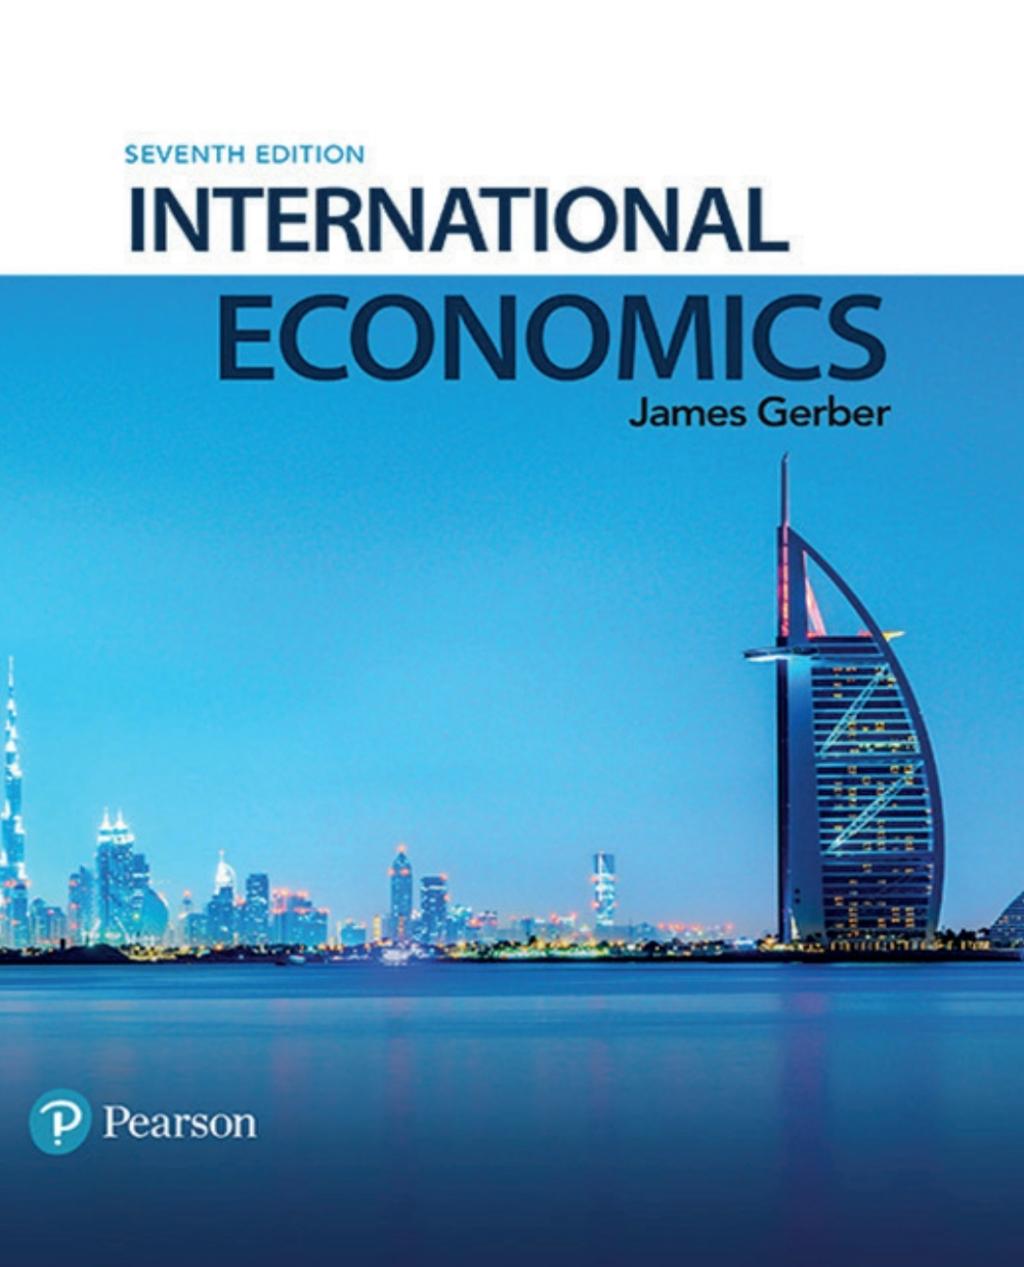 International Economics (eBook Rental)